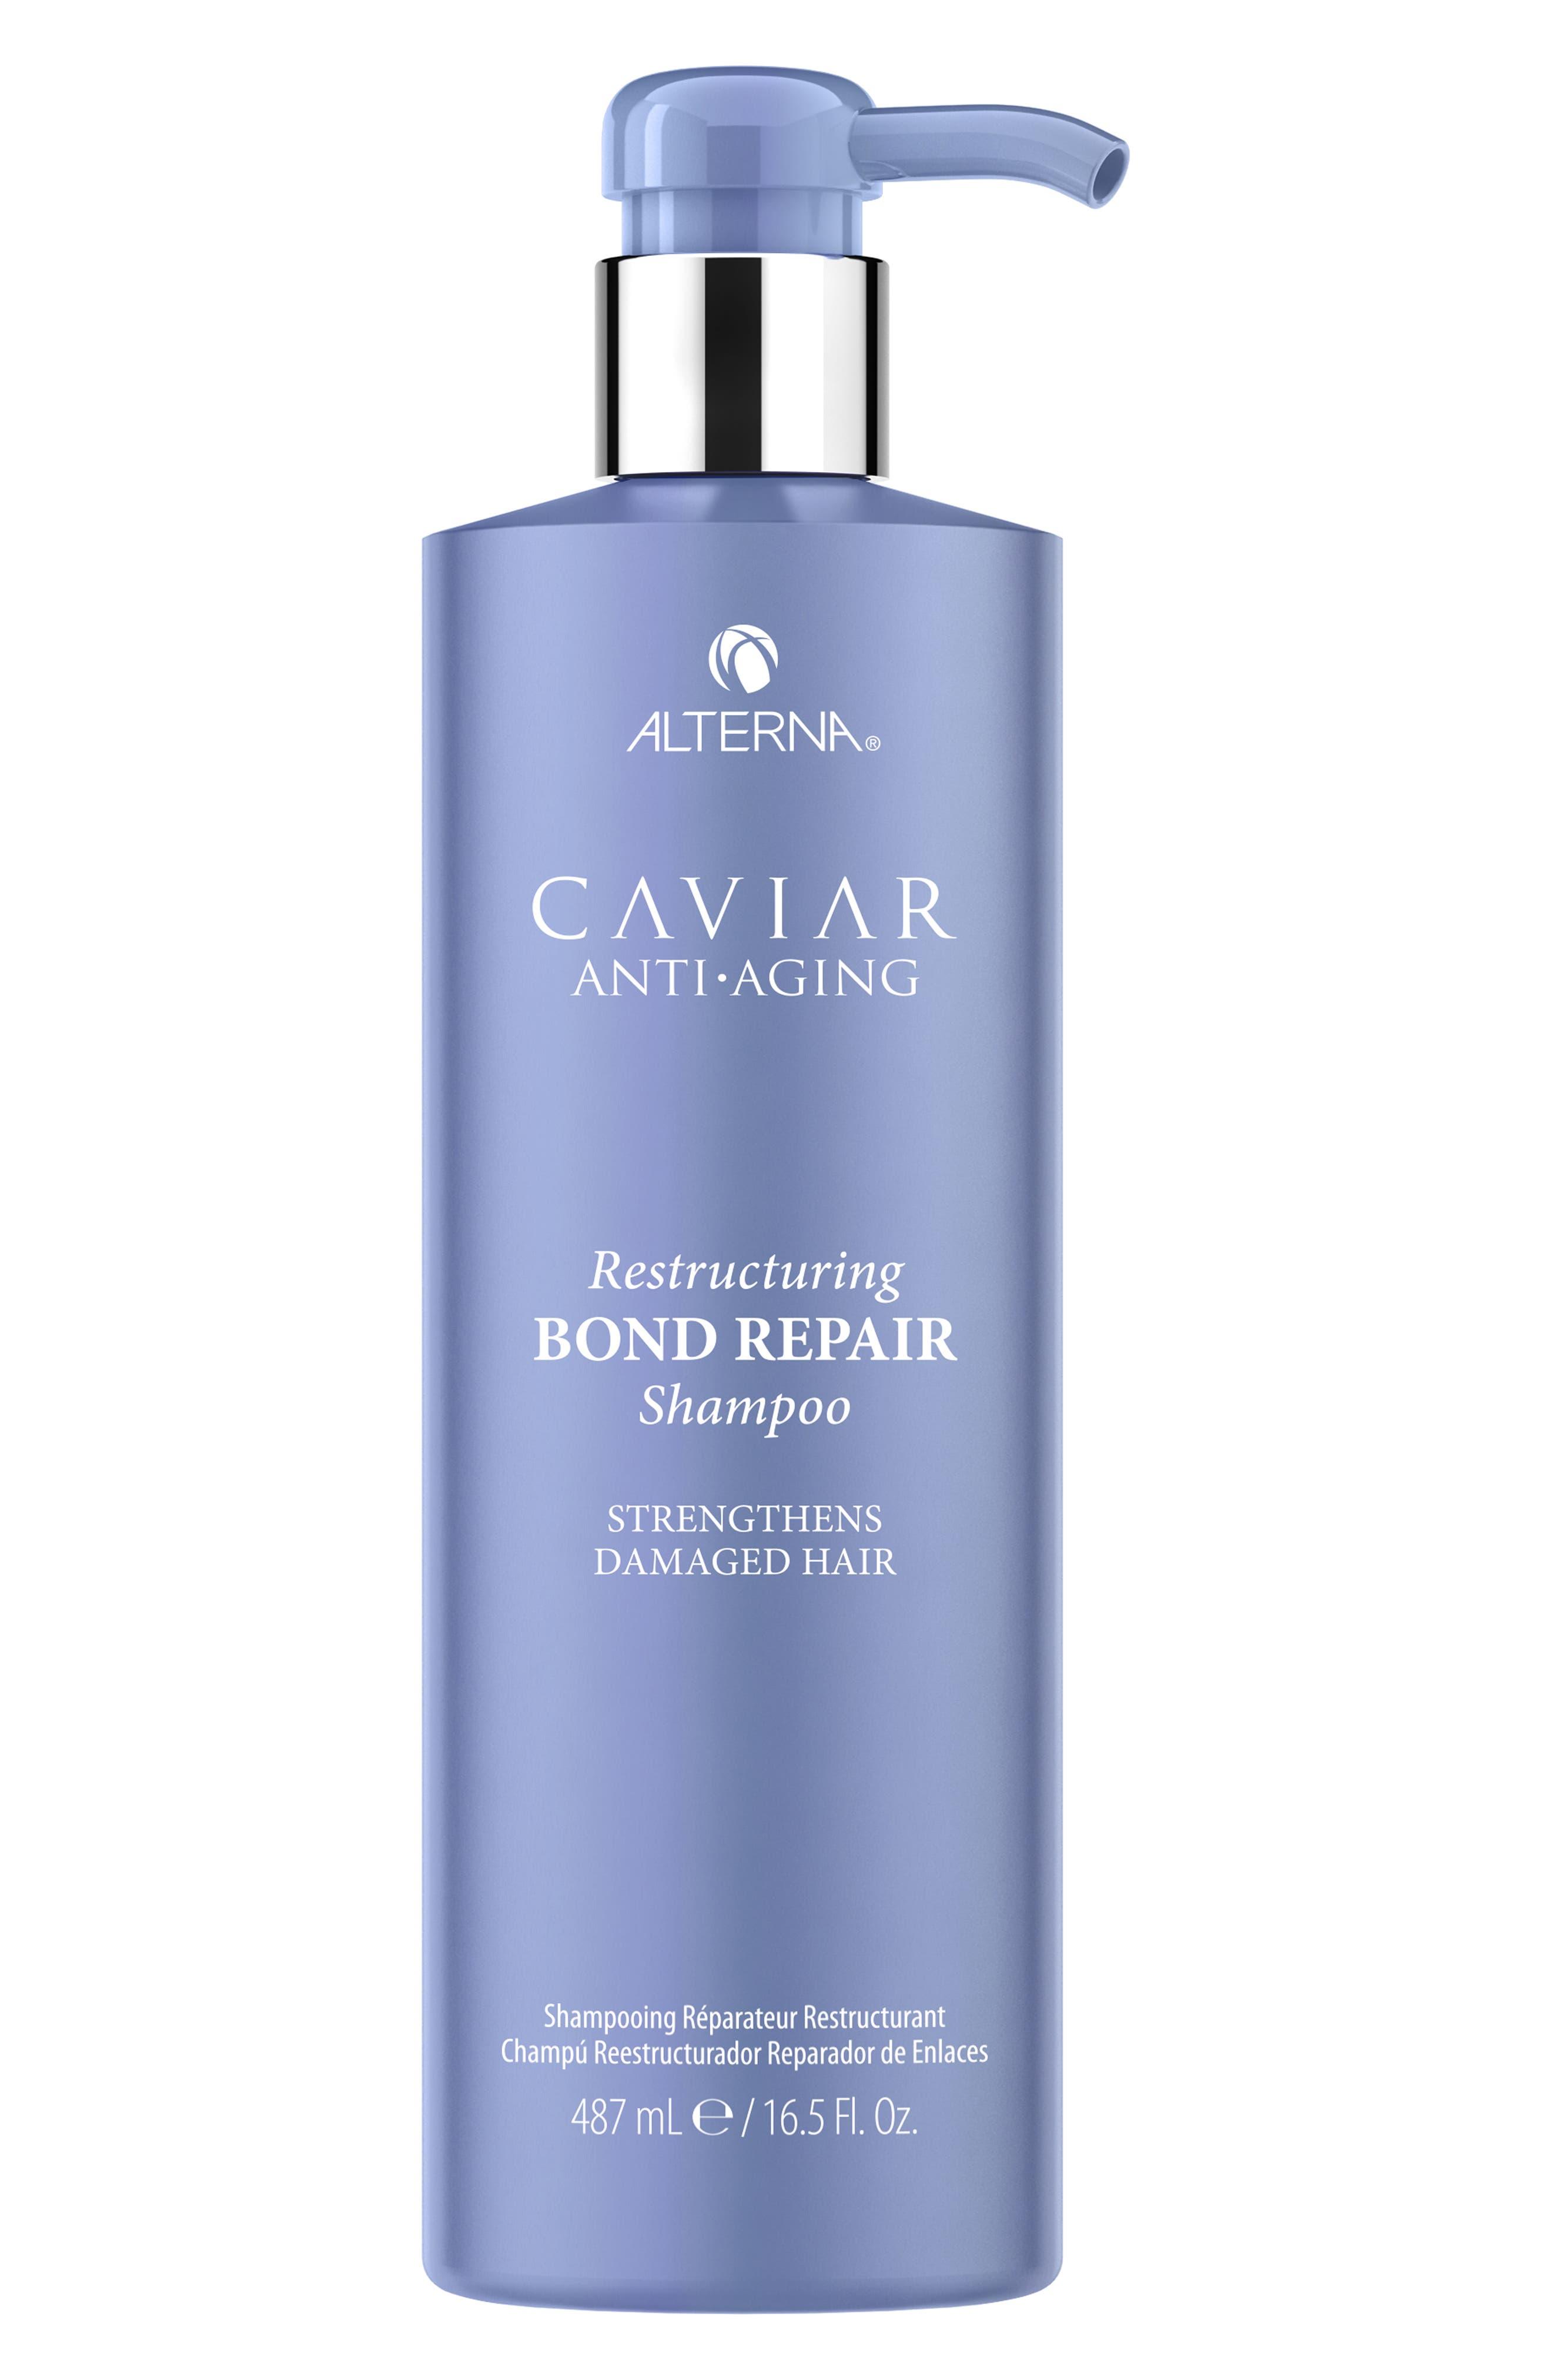 Alterna Caviar Anti-Aging Restructuring Bond Repair Shampoo